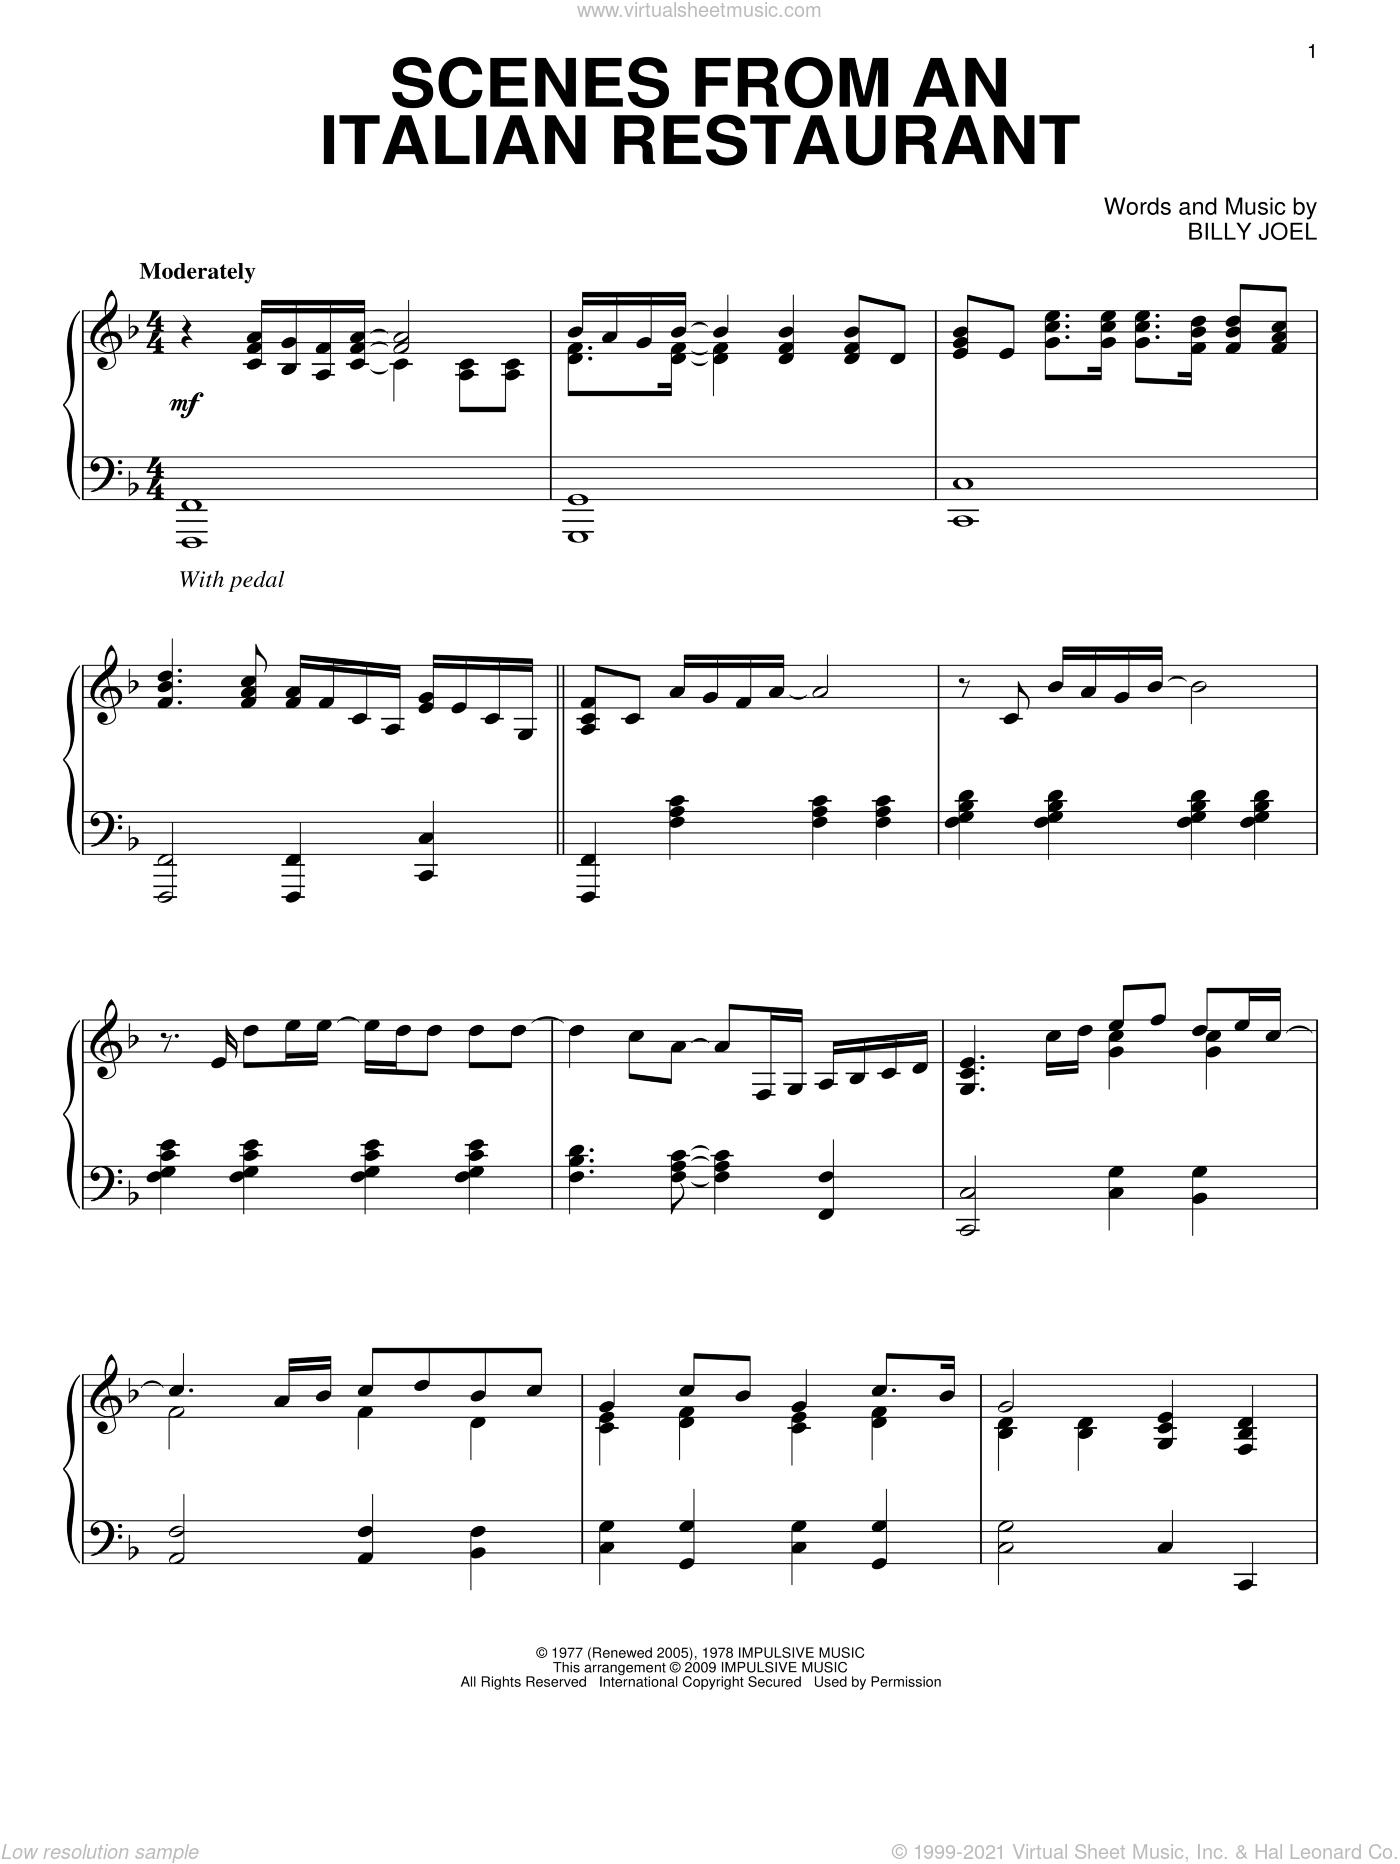 Scenes From An Italian Restaurant sheet music for piano solo by Billy Joel, intermediate skill level